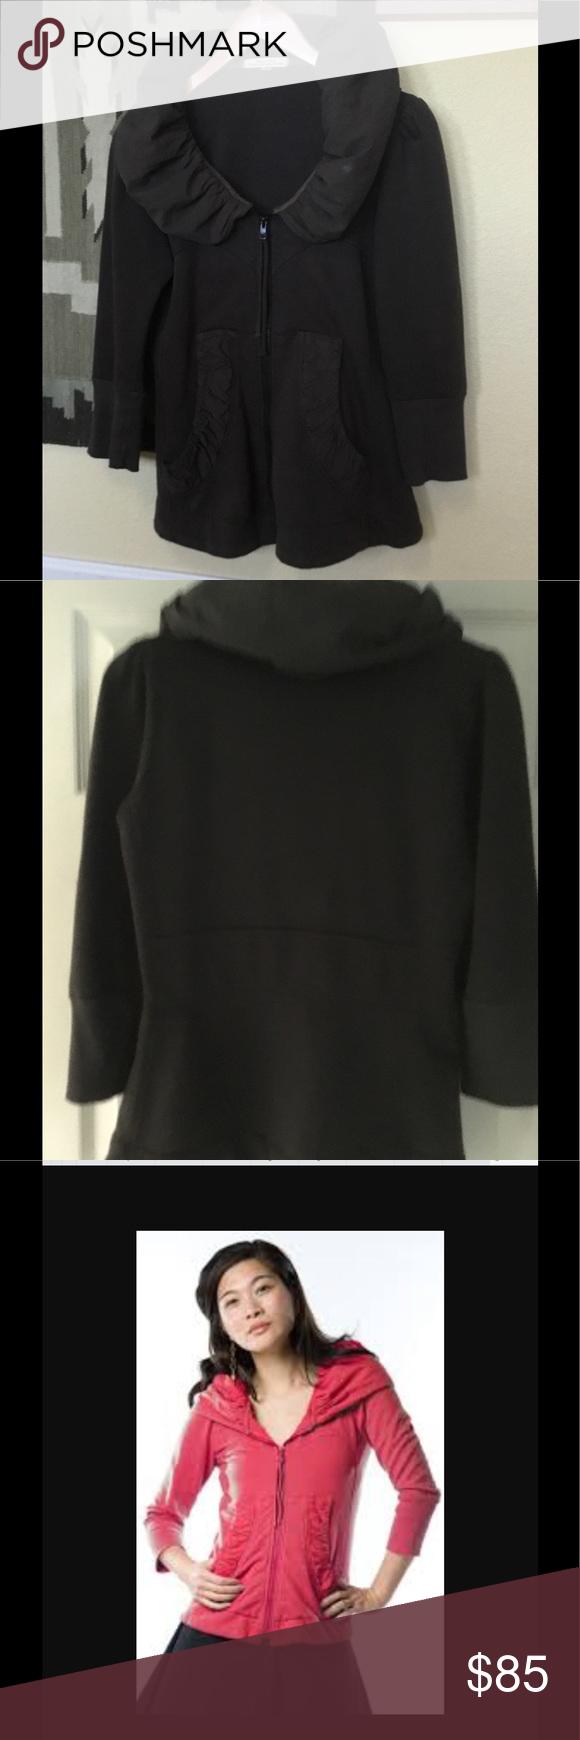 Prairie underground 3/4 sleeve cloak hoodie Excellent